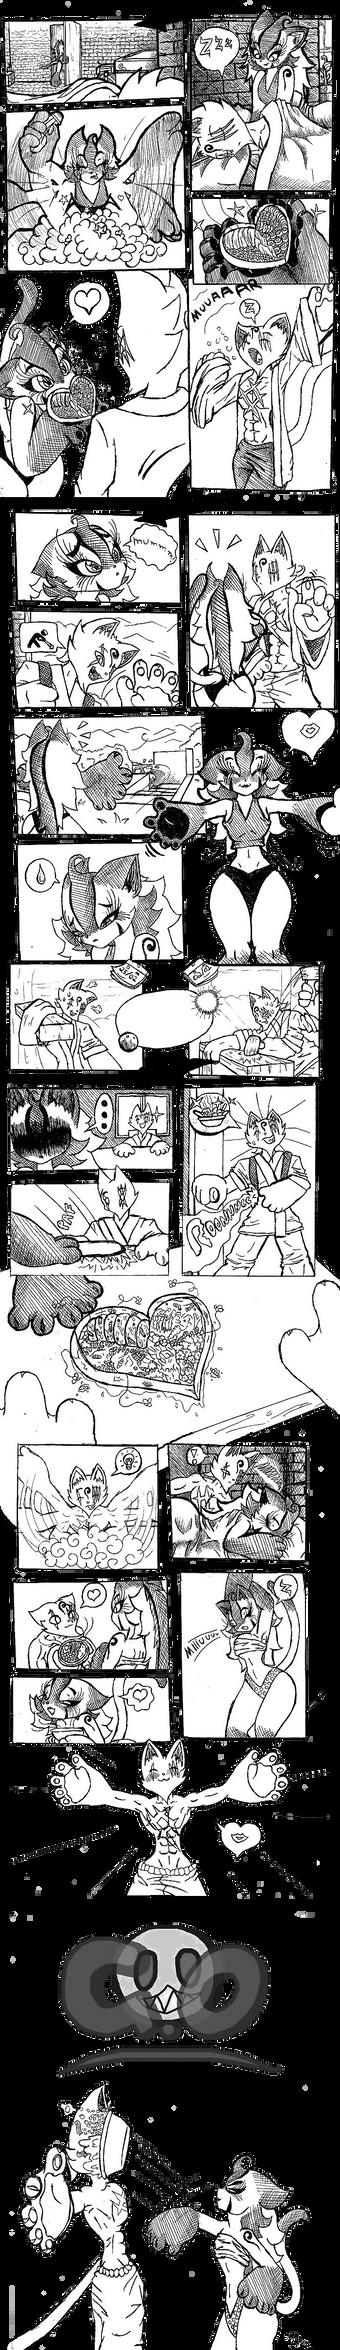 Tacca e Flowery by yagorocha